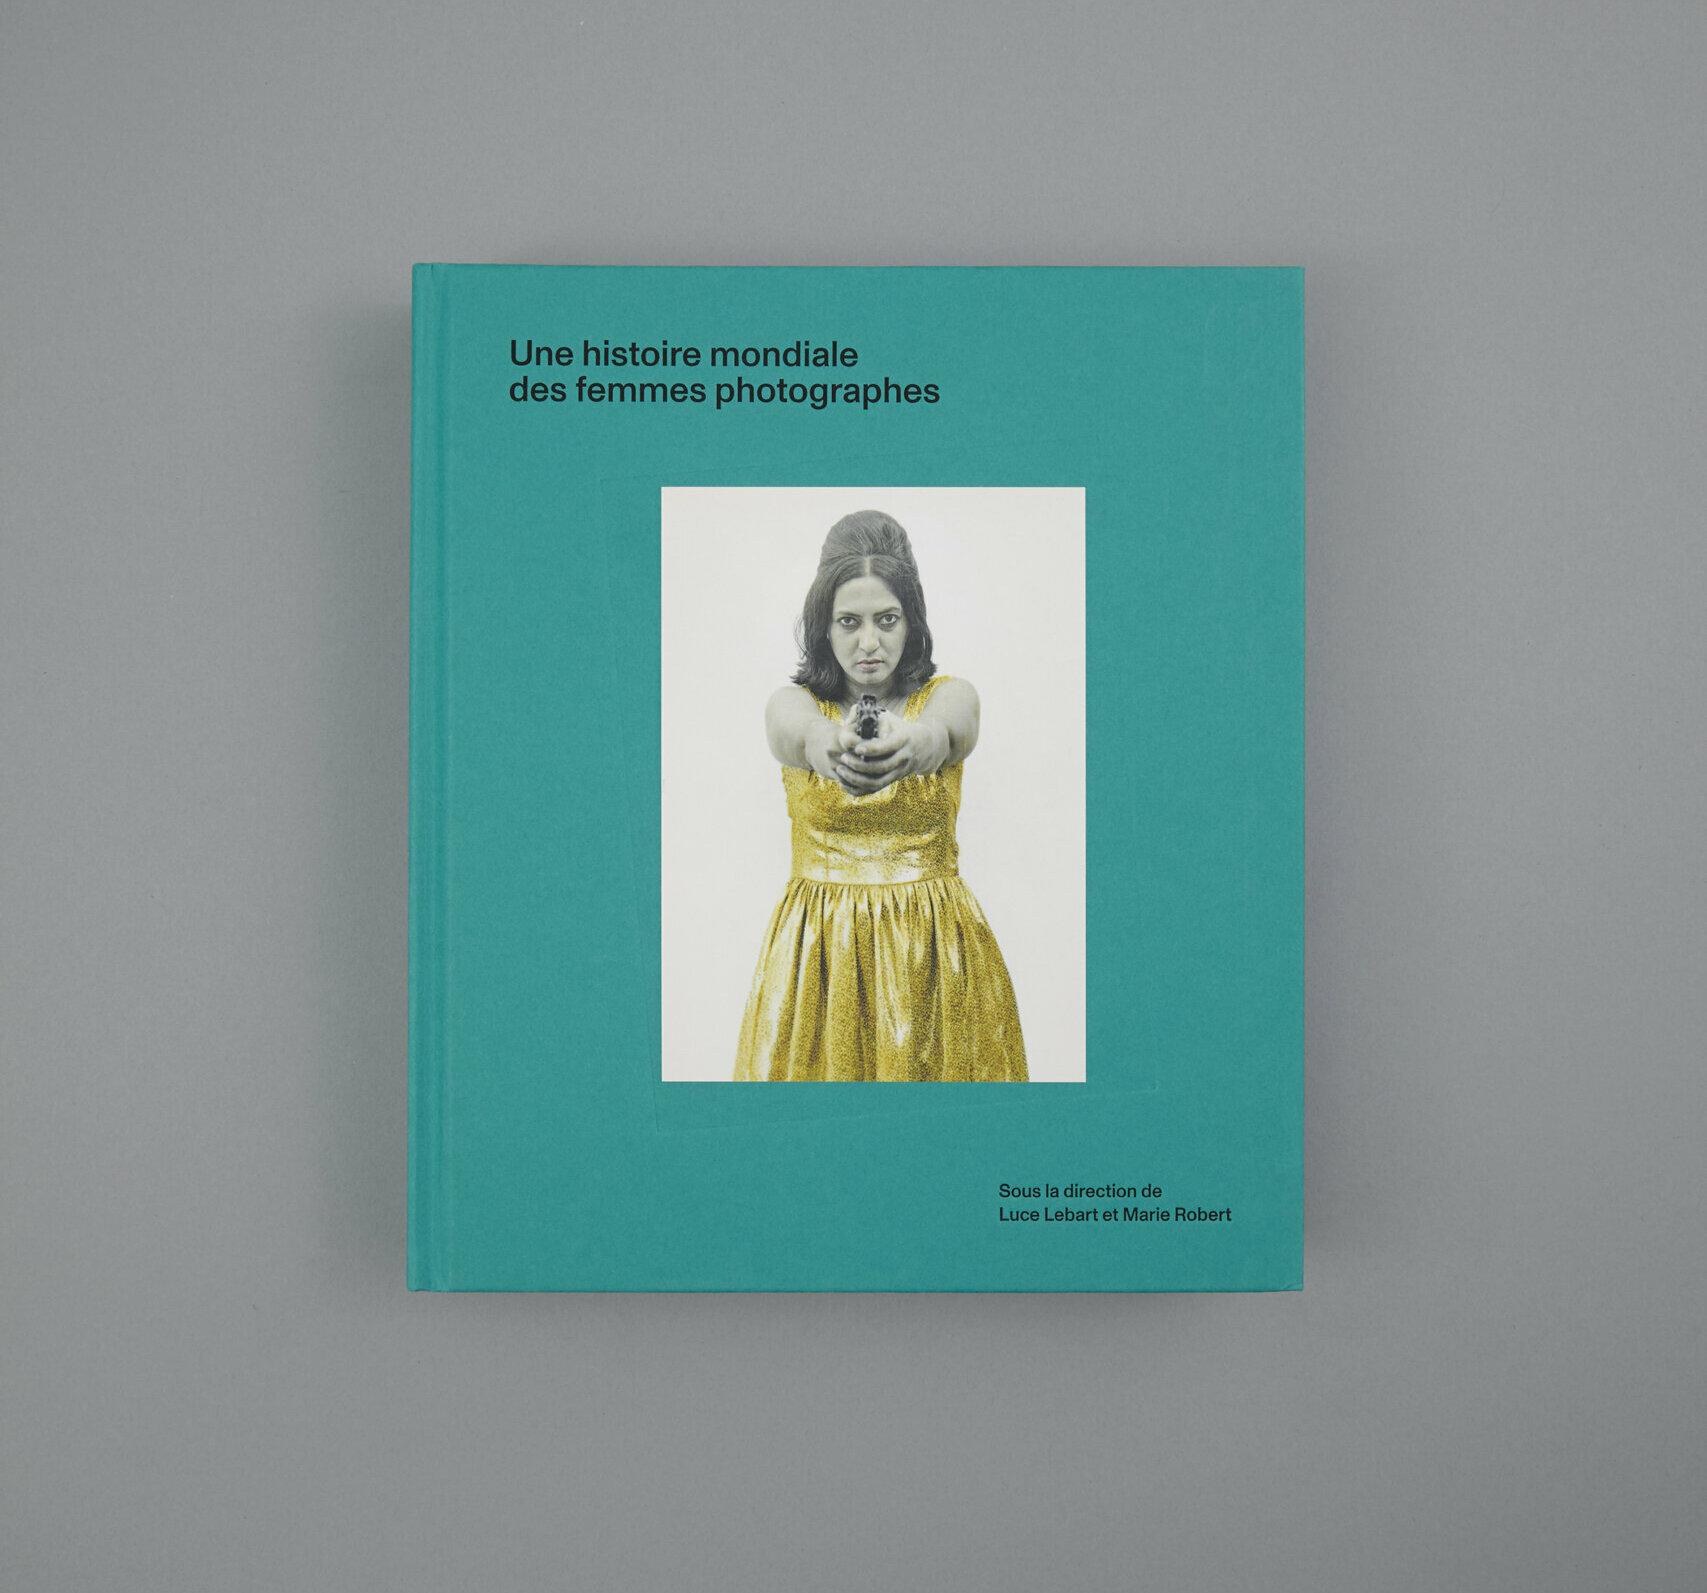 lebart-robert-dahan-histoire-mondiale-femmes-photographes-delpire-co-1